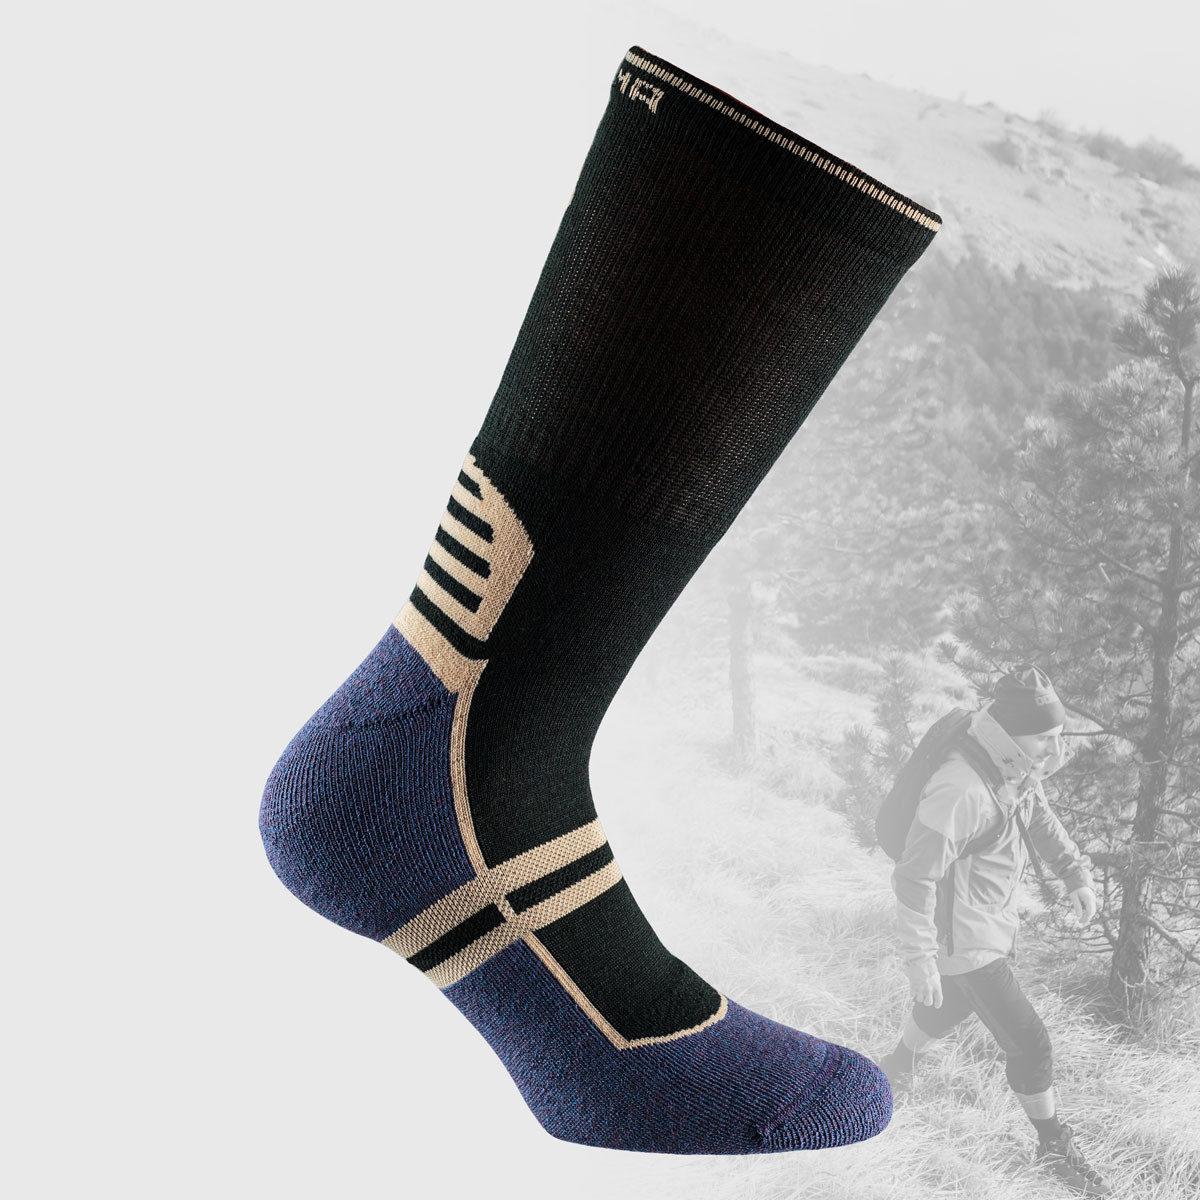 black hiking socks with purple sole